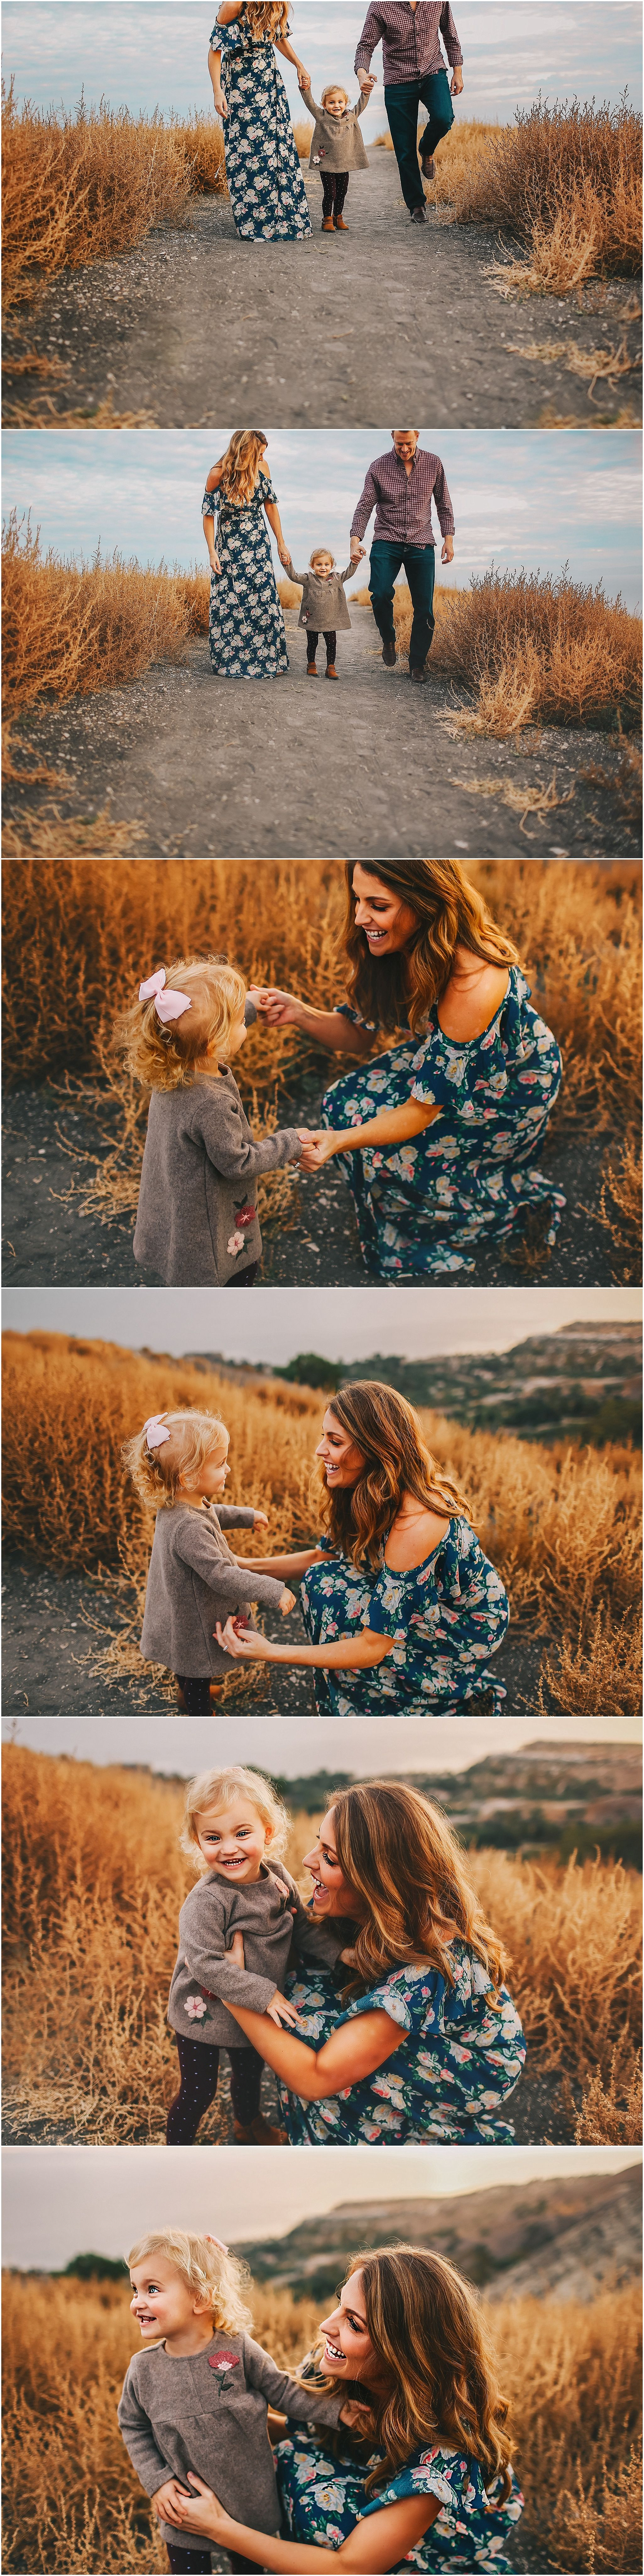 PALOS VERDES FAMILY PHOTOGRAPHER #familyphotooutfits